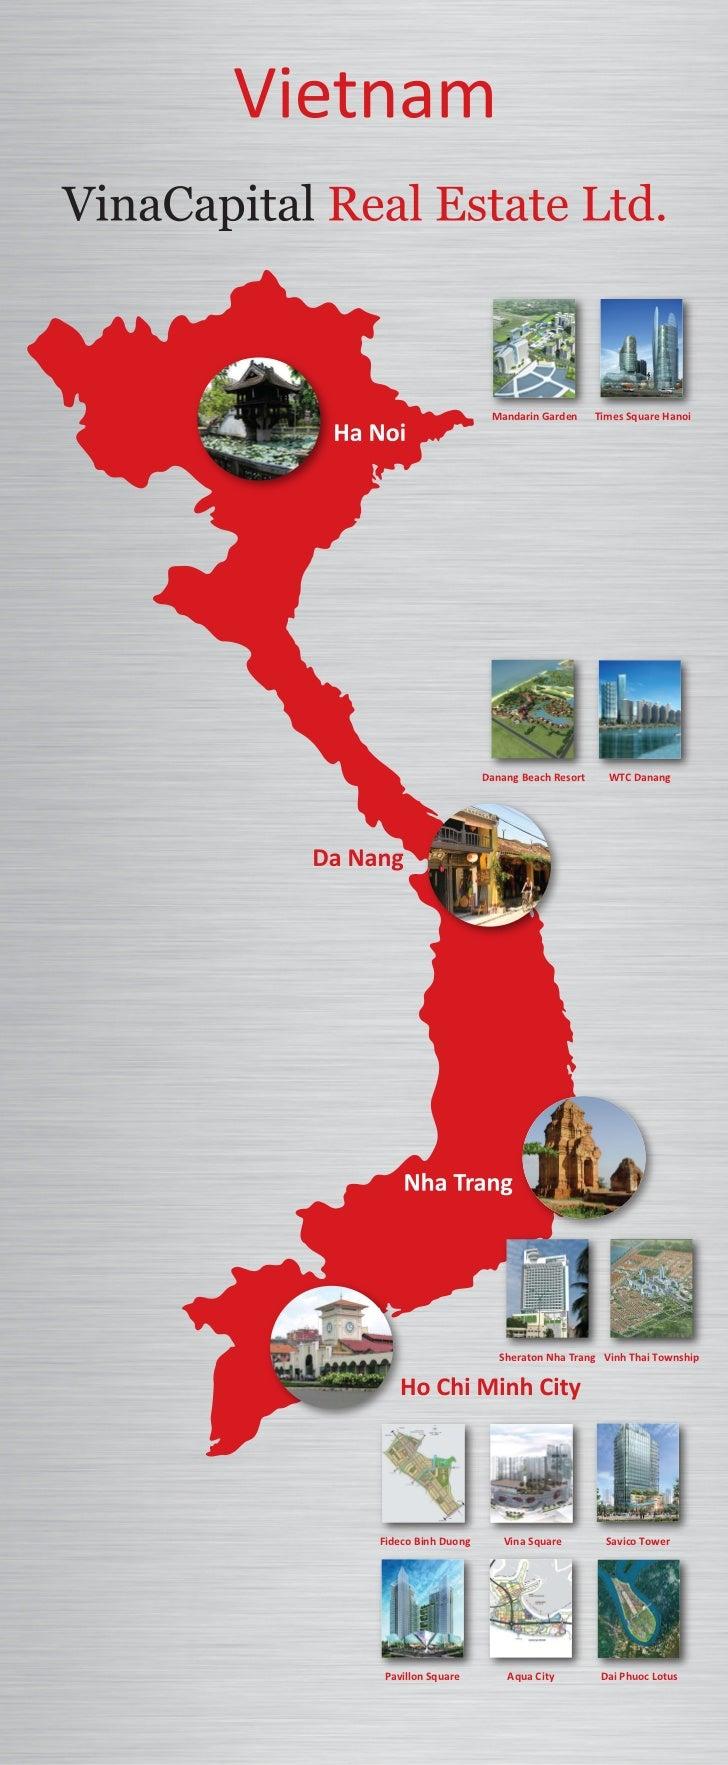 Mandarin Garden      Times Square Hanoi                    Danang Beach Resort     WTC Danang                       Sherat...